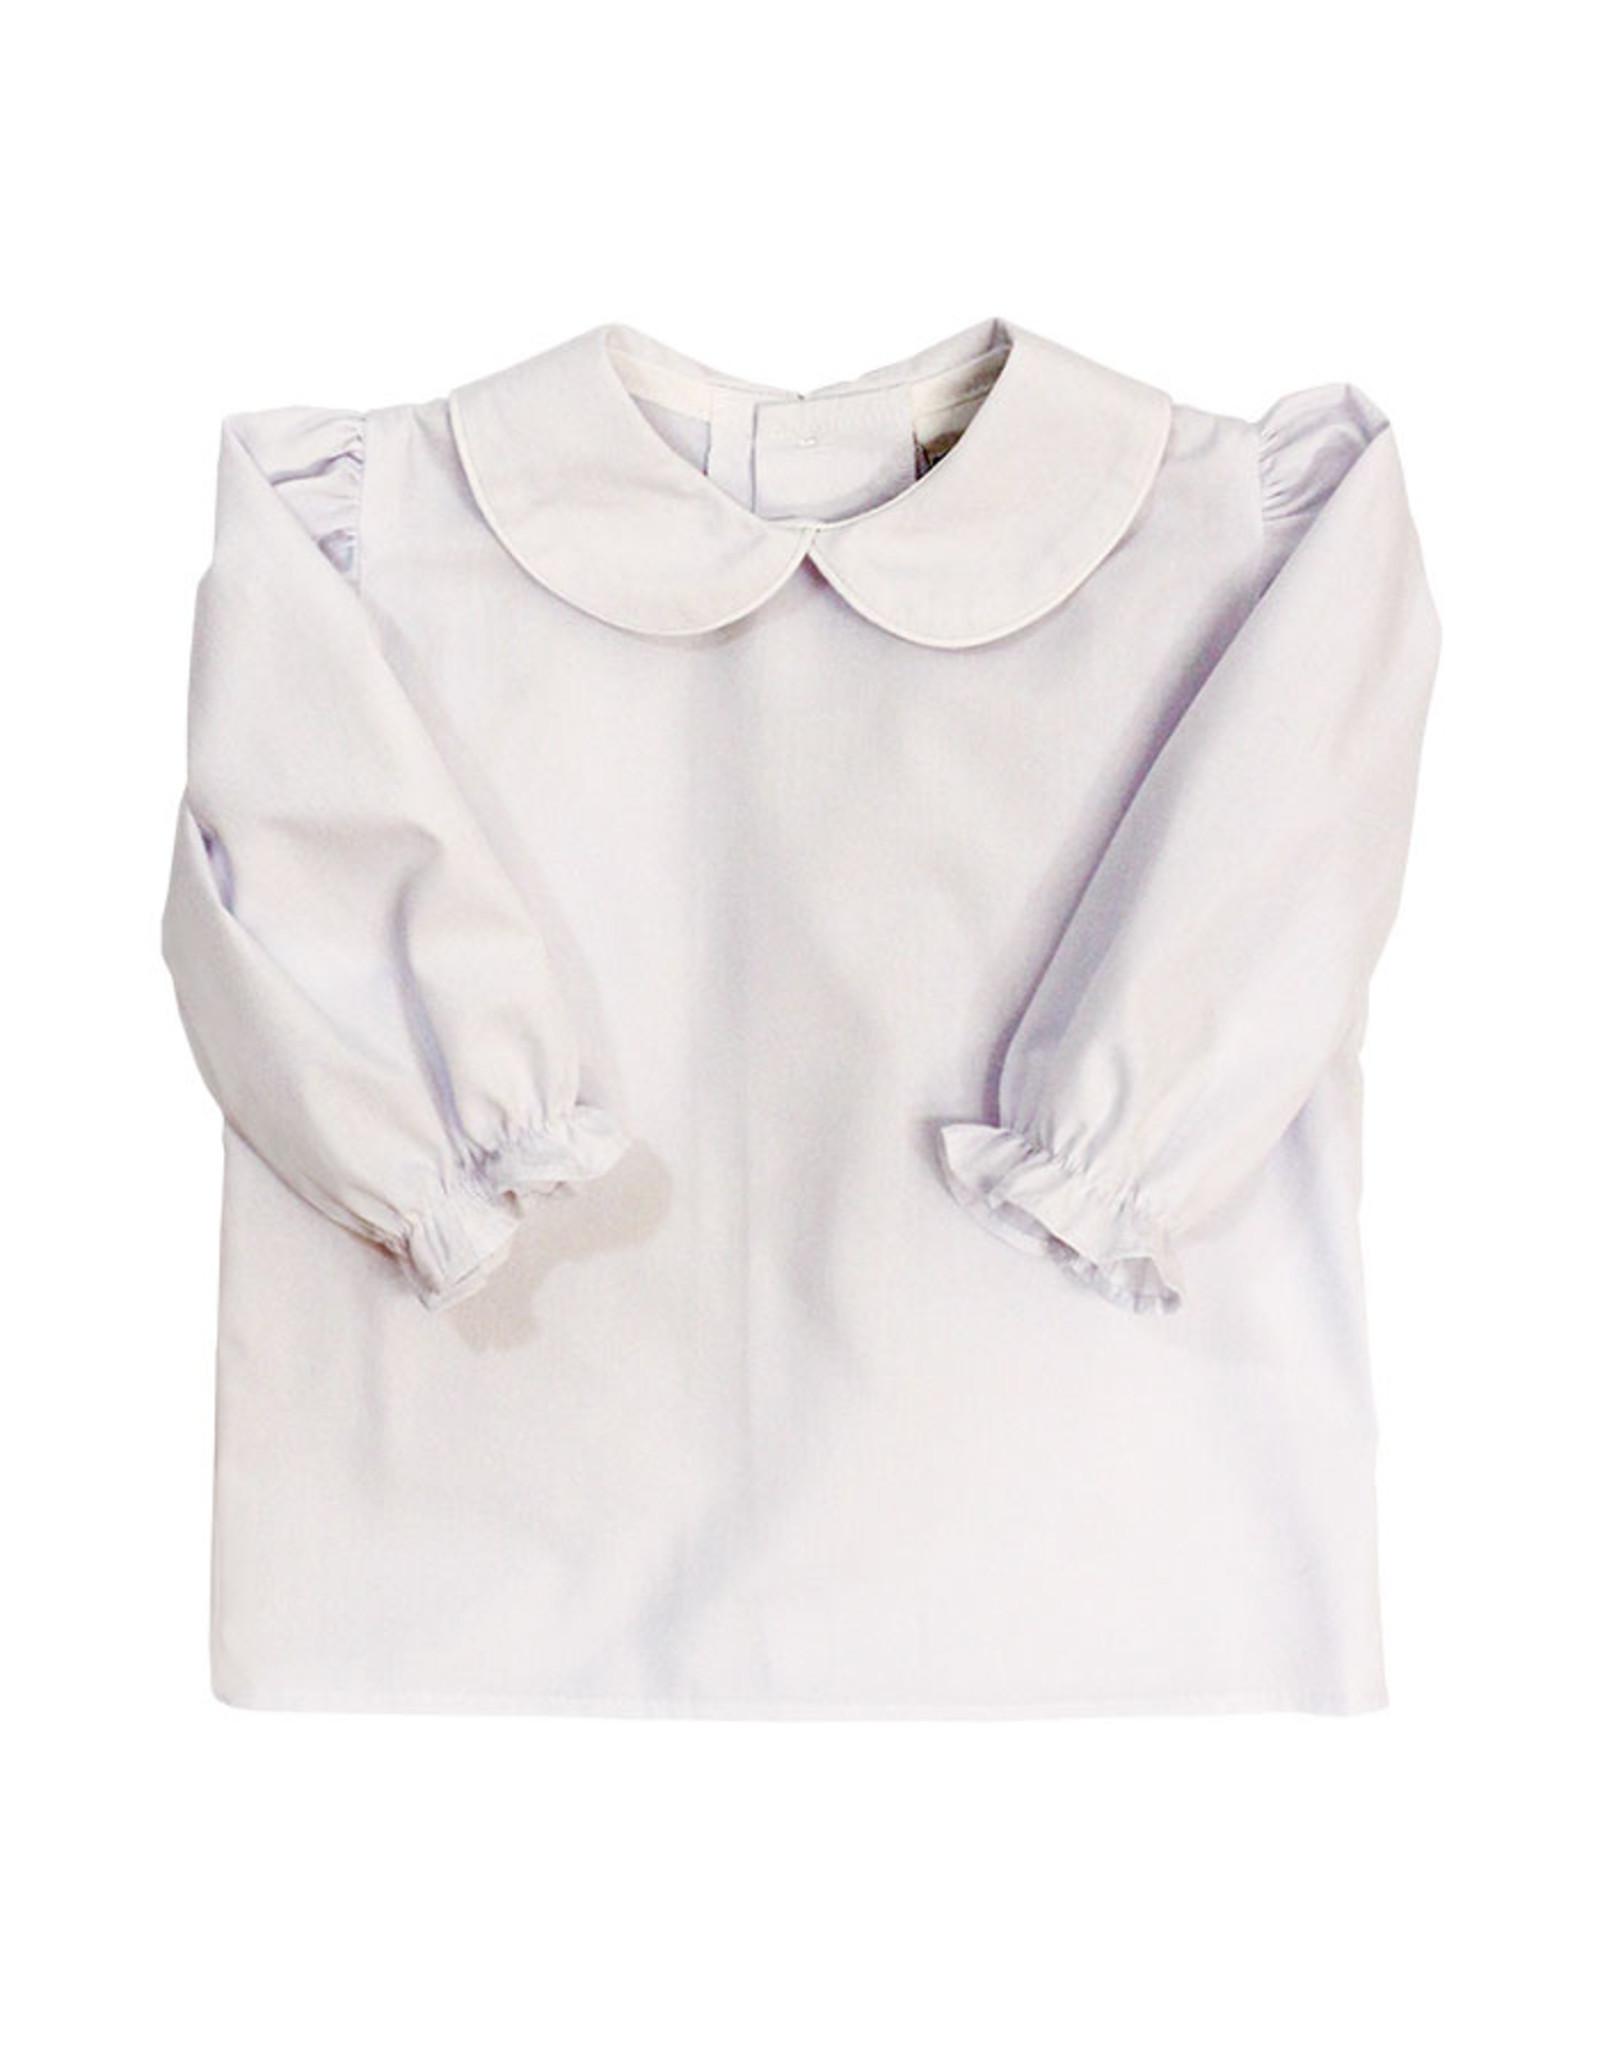 The Bailey Boys Longsleeve Girls Button Back Peter Pan Collar Blouse